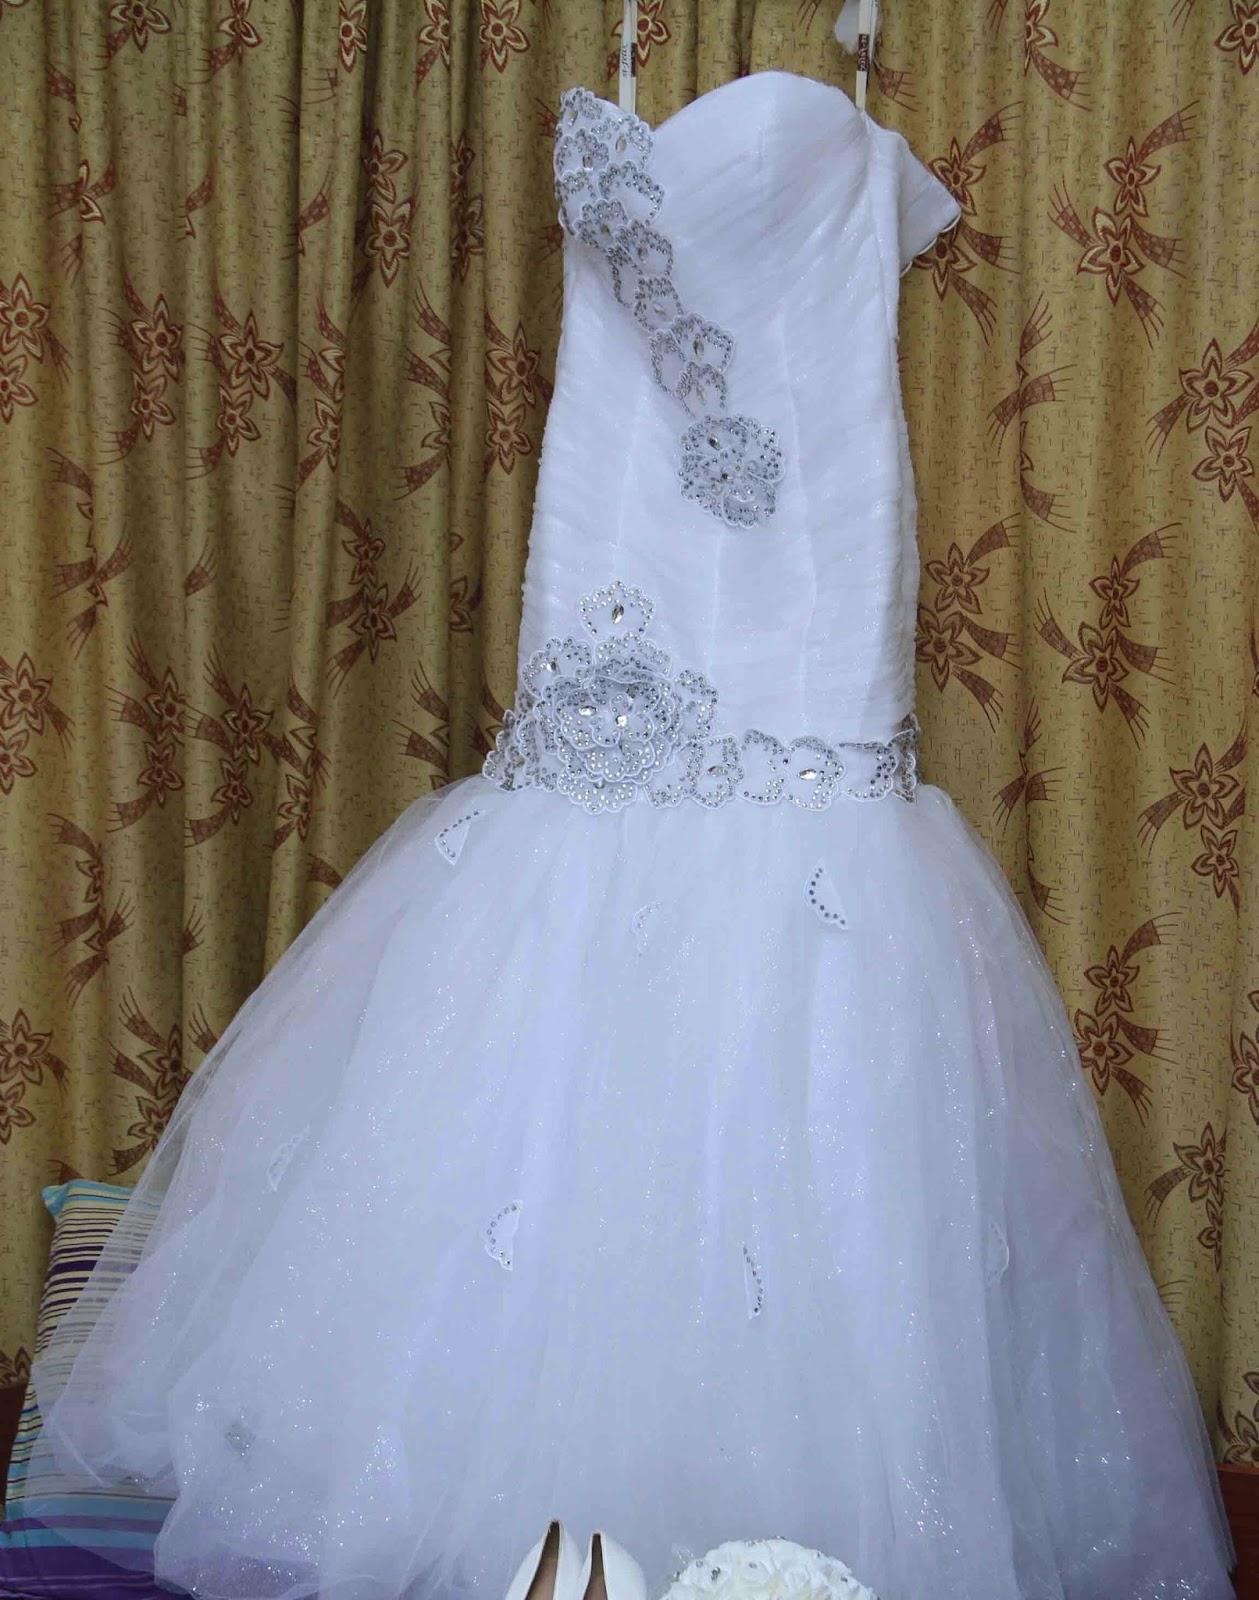 Wedding Dress Buyers 16 Perfect Its a very beautiful